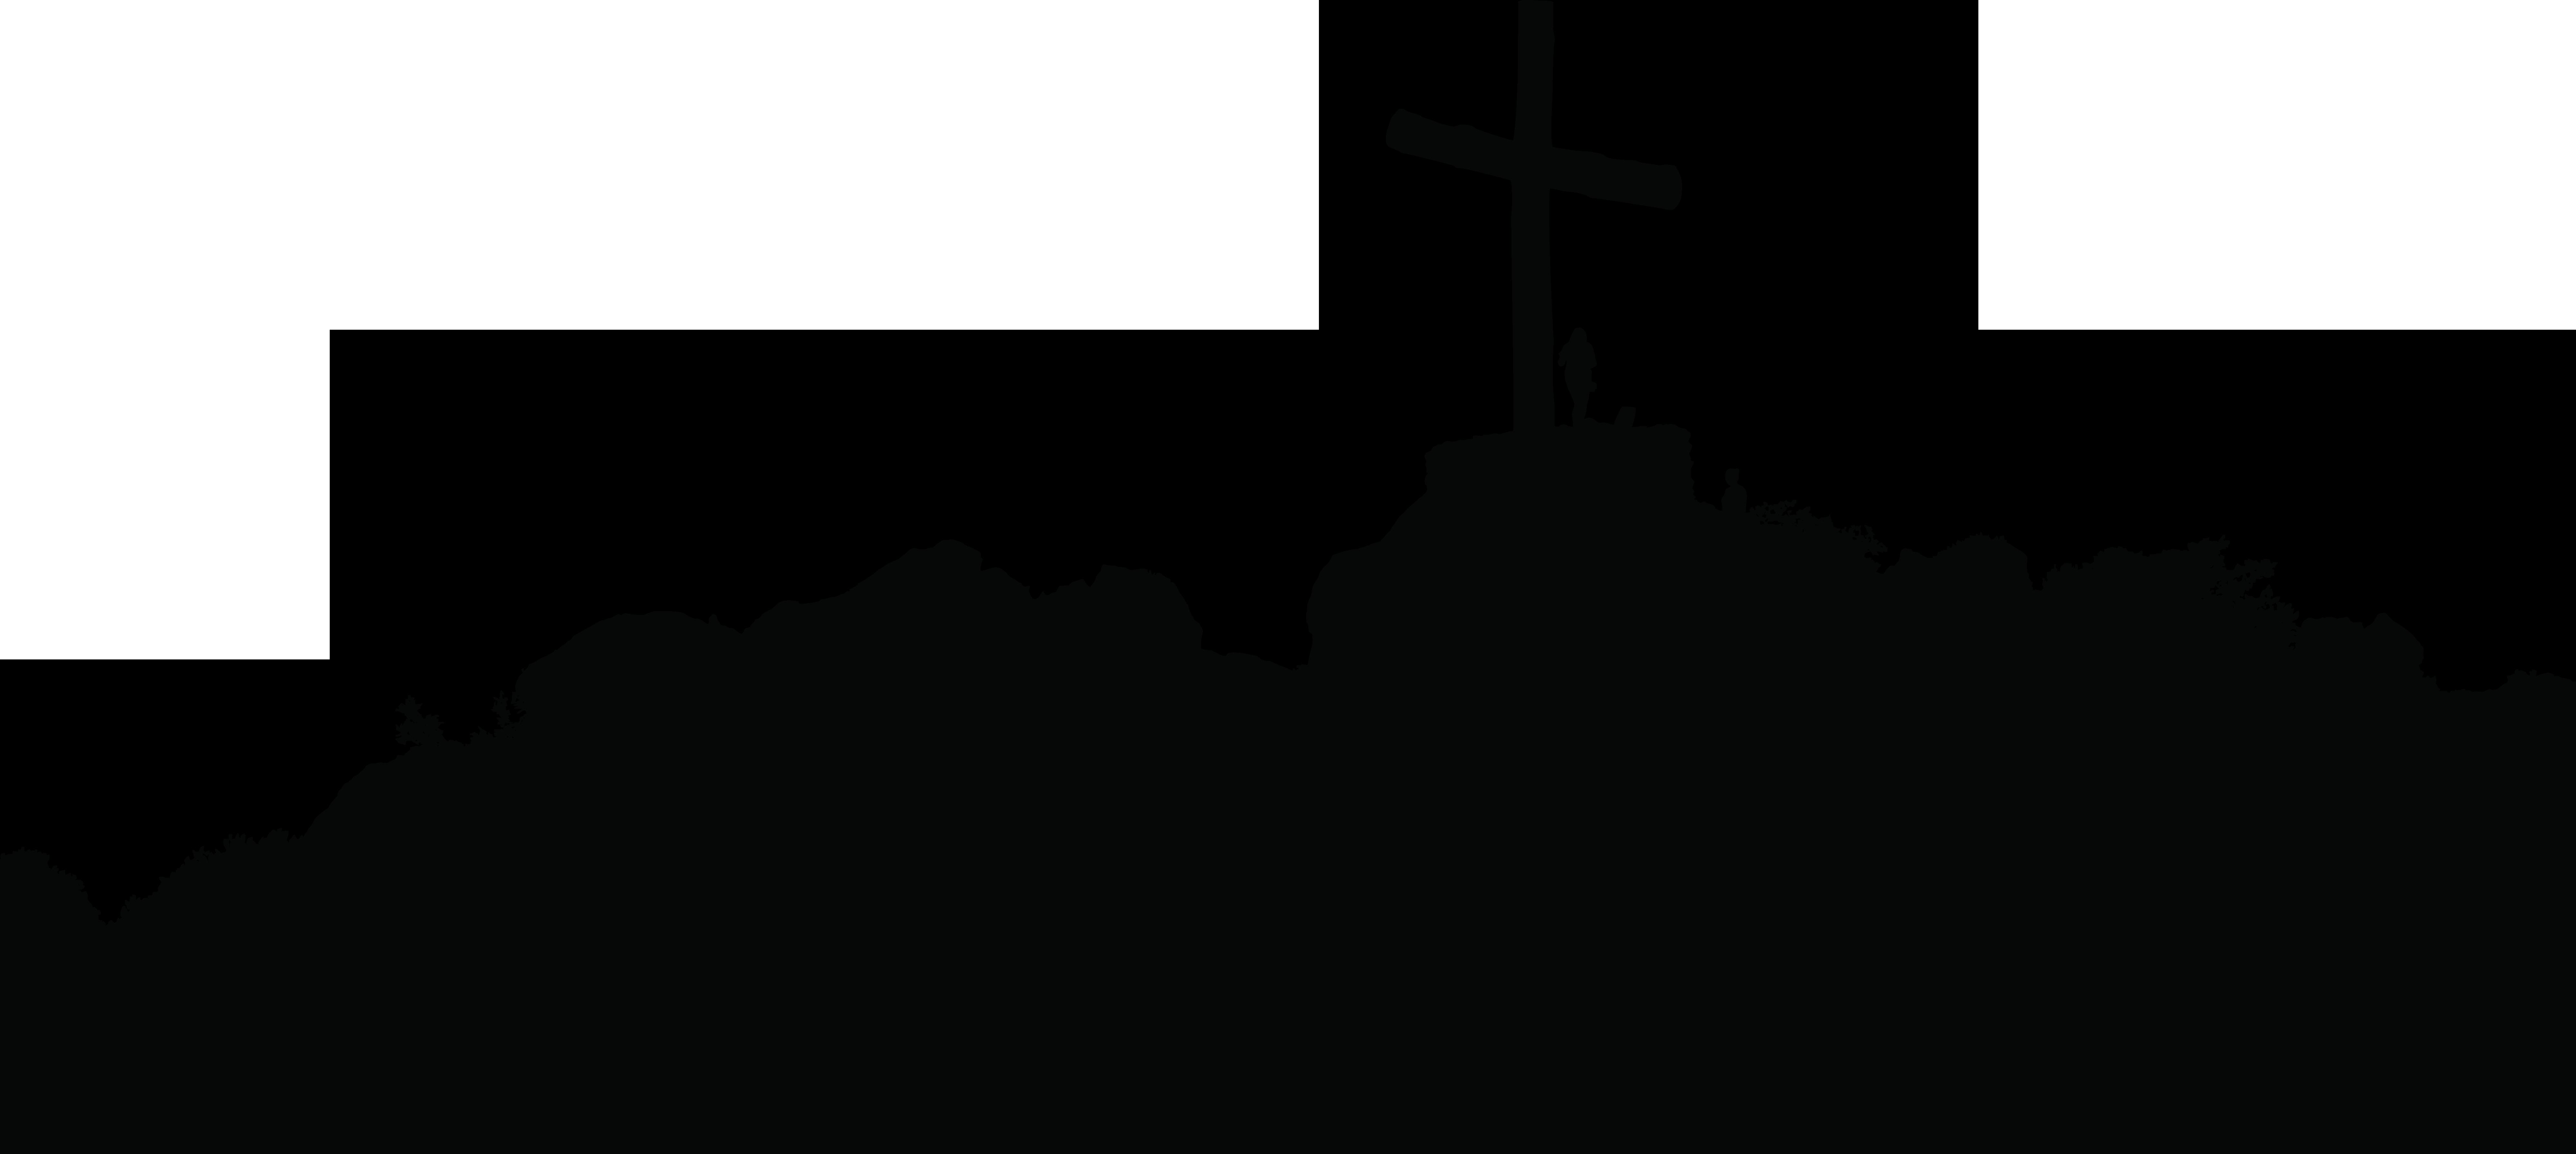 svg Silhouette clip art hill. Christian cross clipart black and white